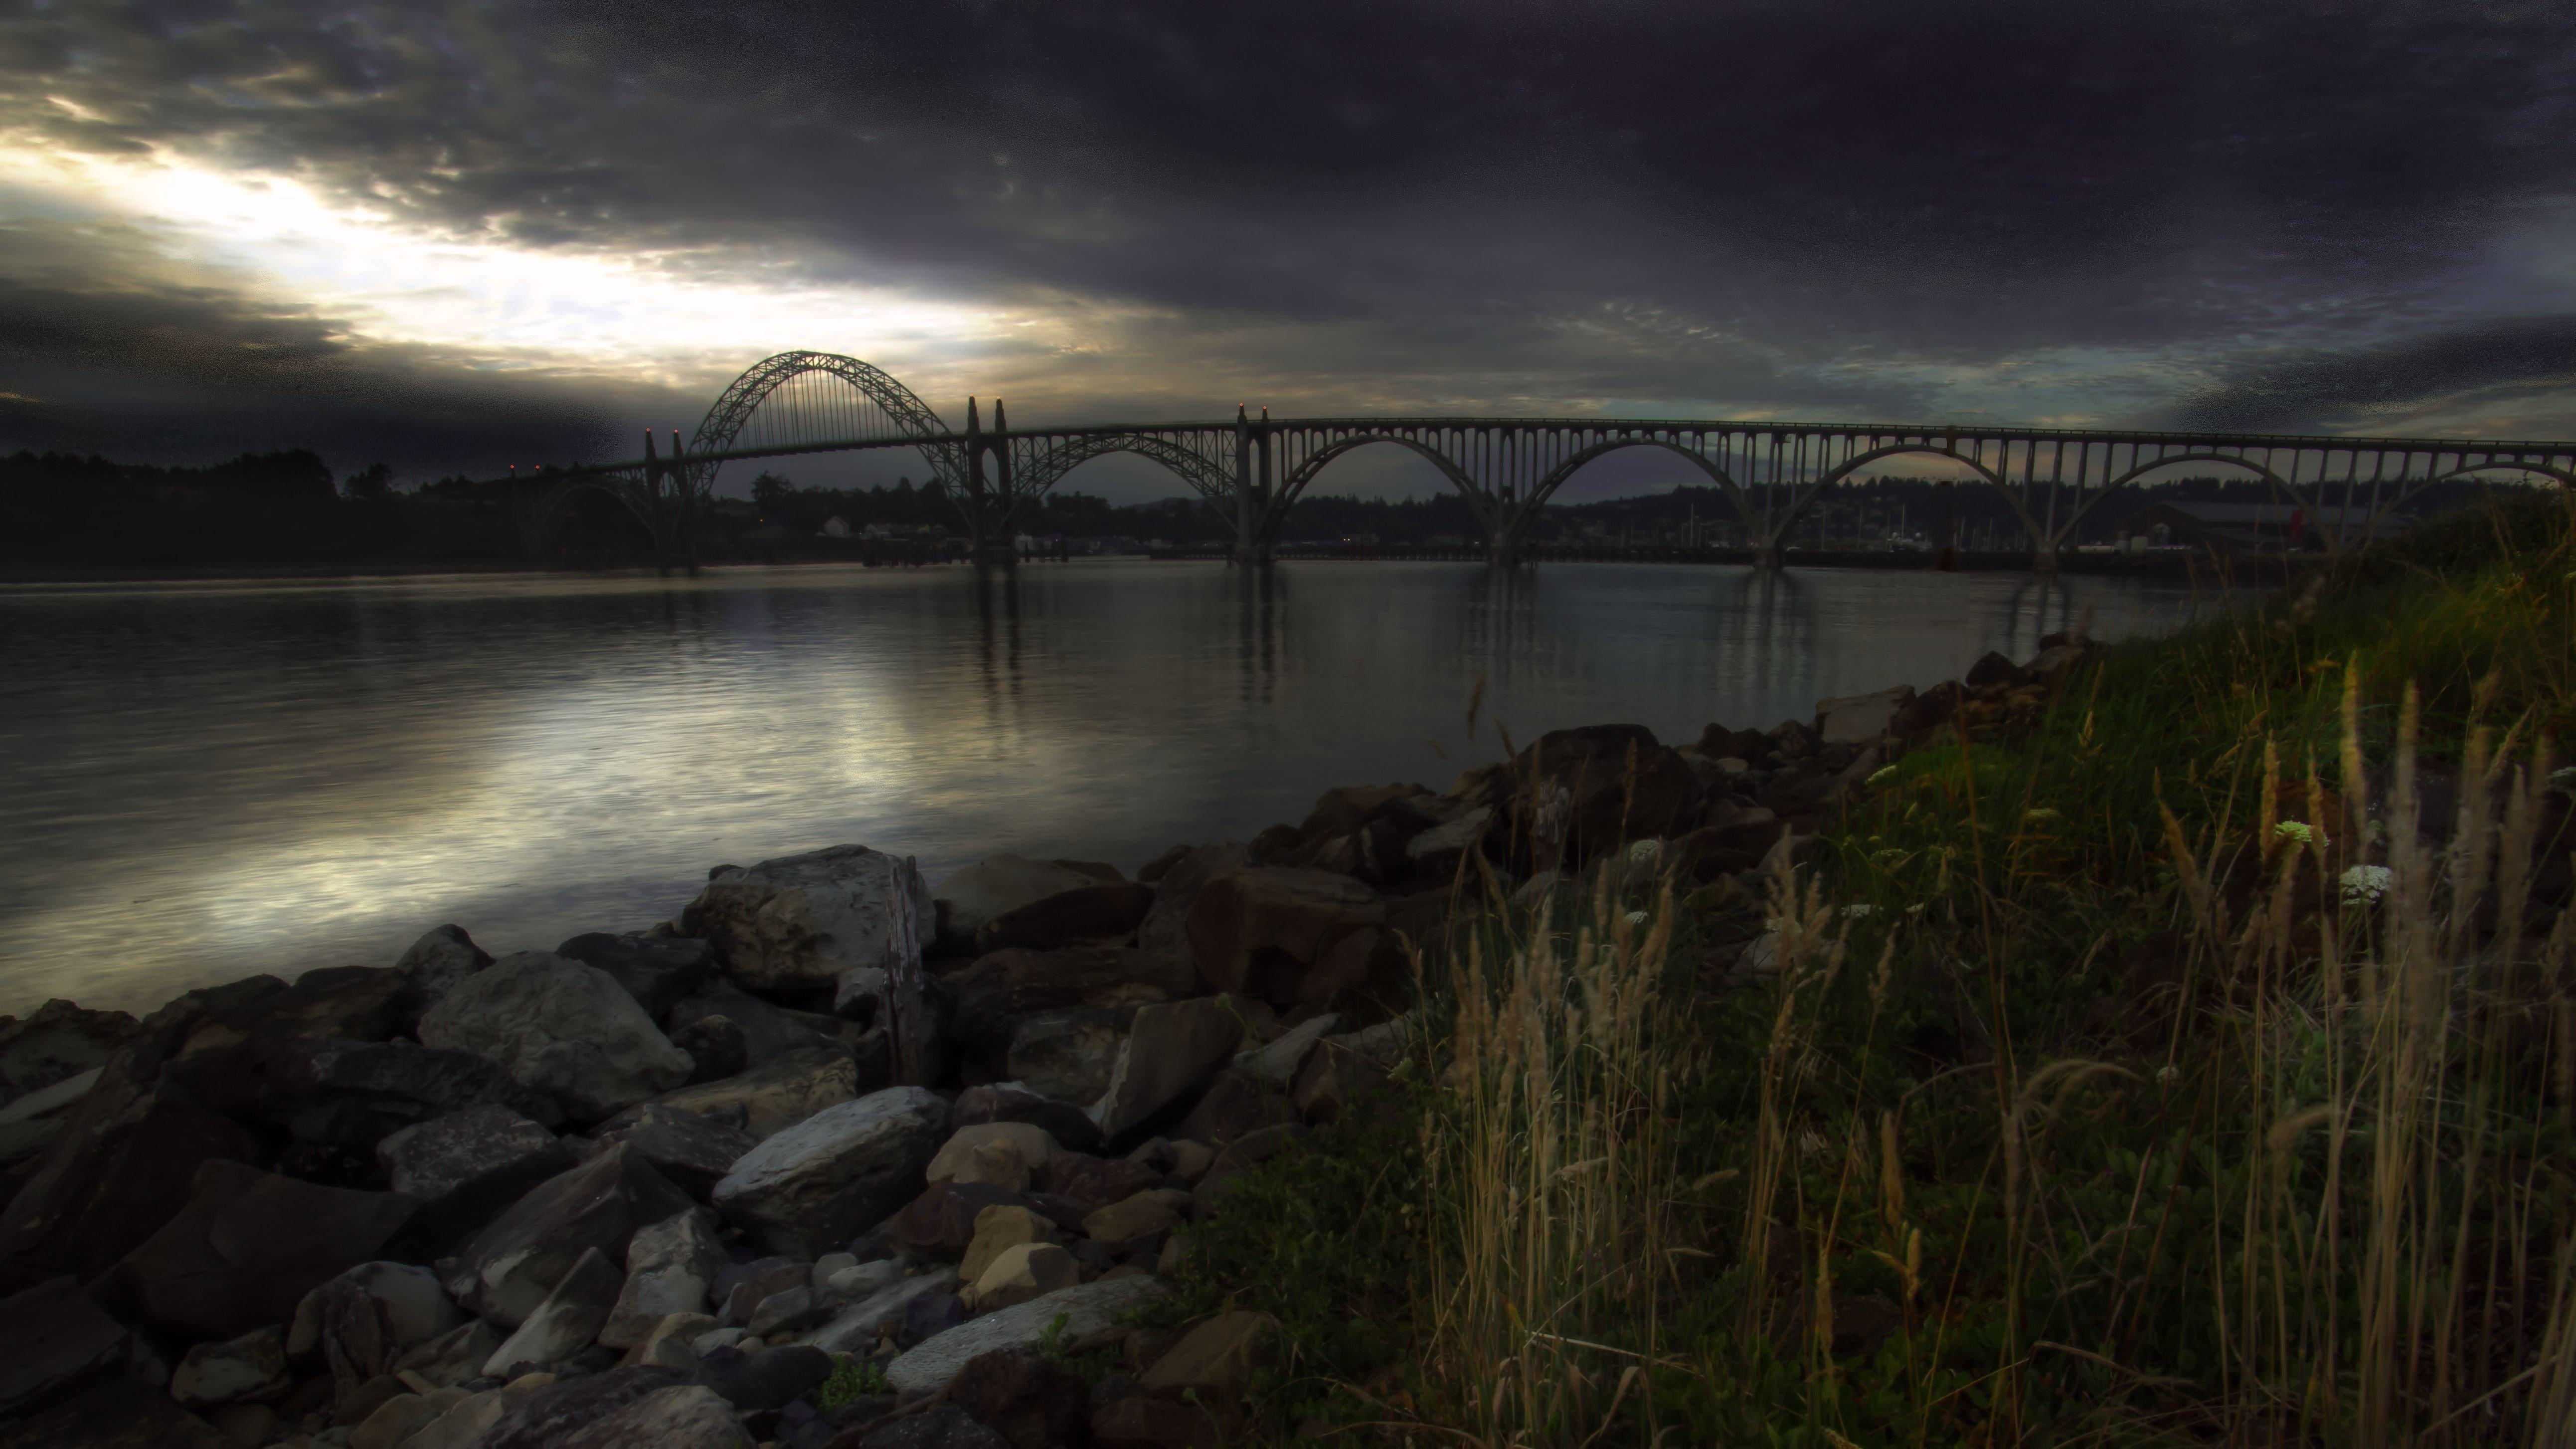 Jon Lipinski turned this daytime shot into nighttime.